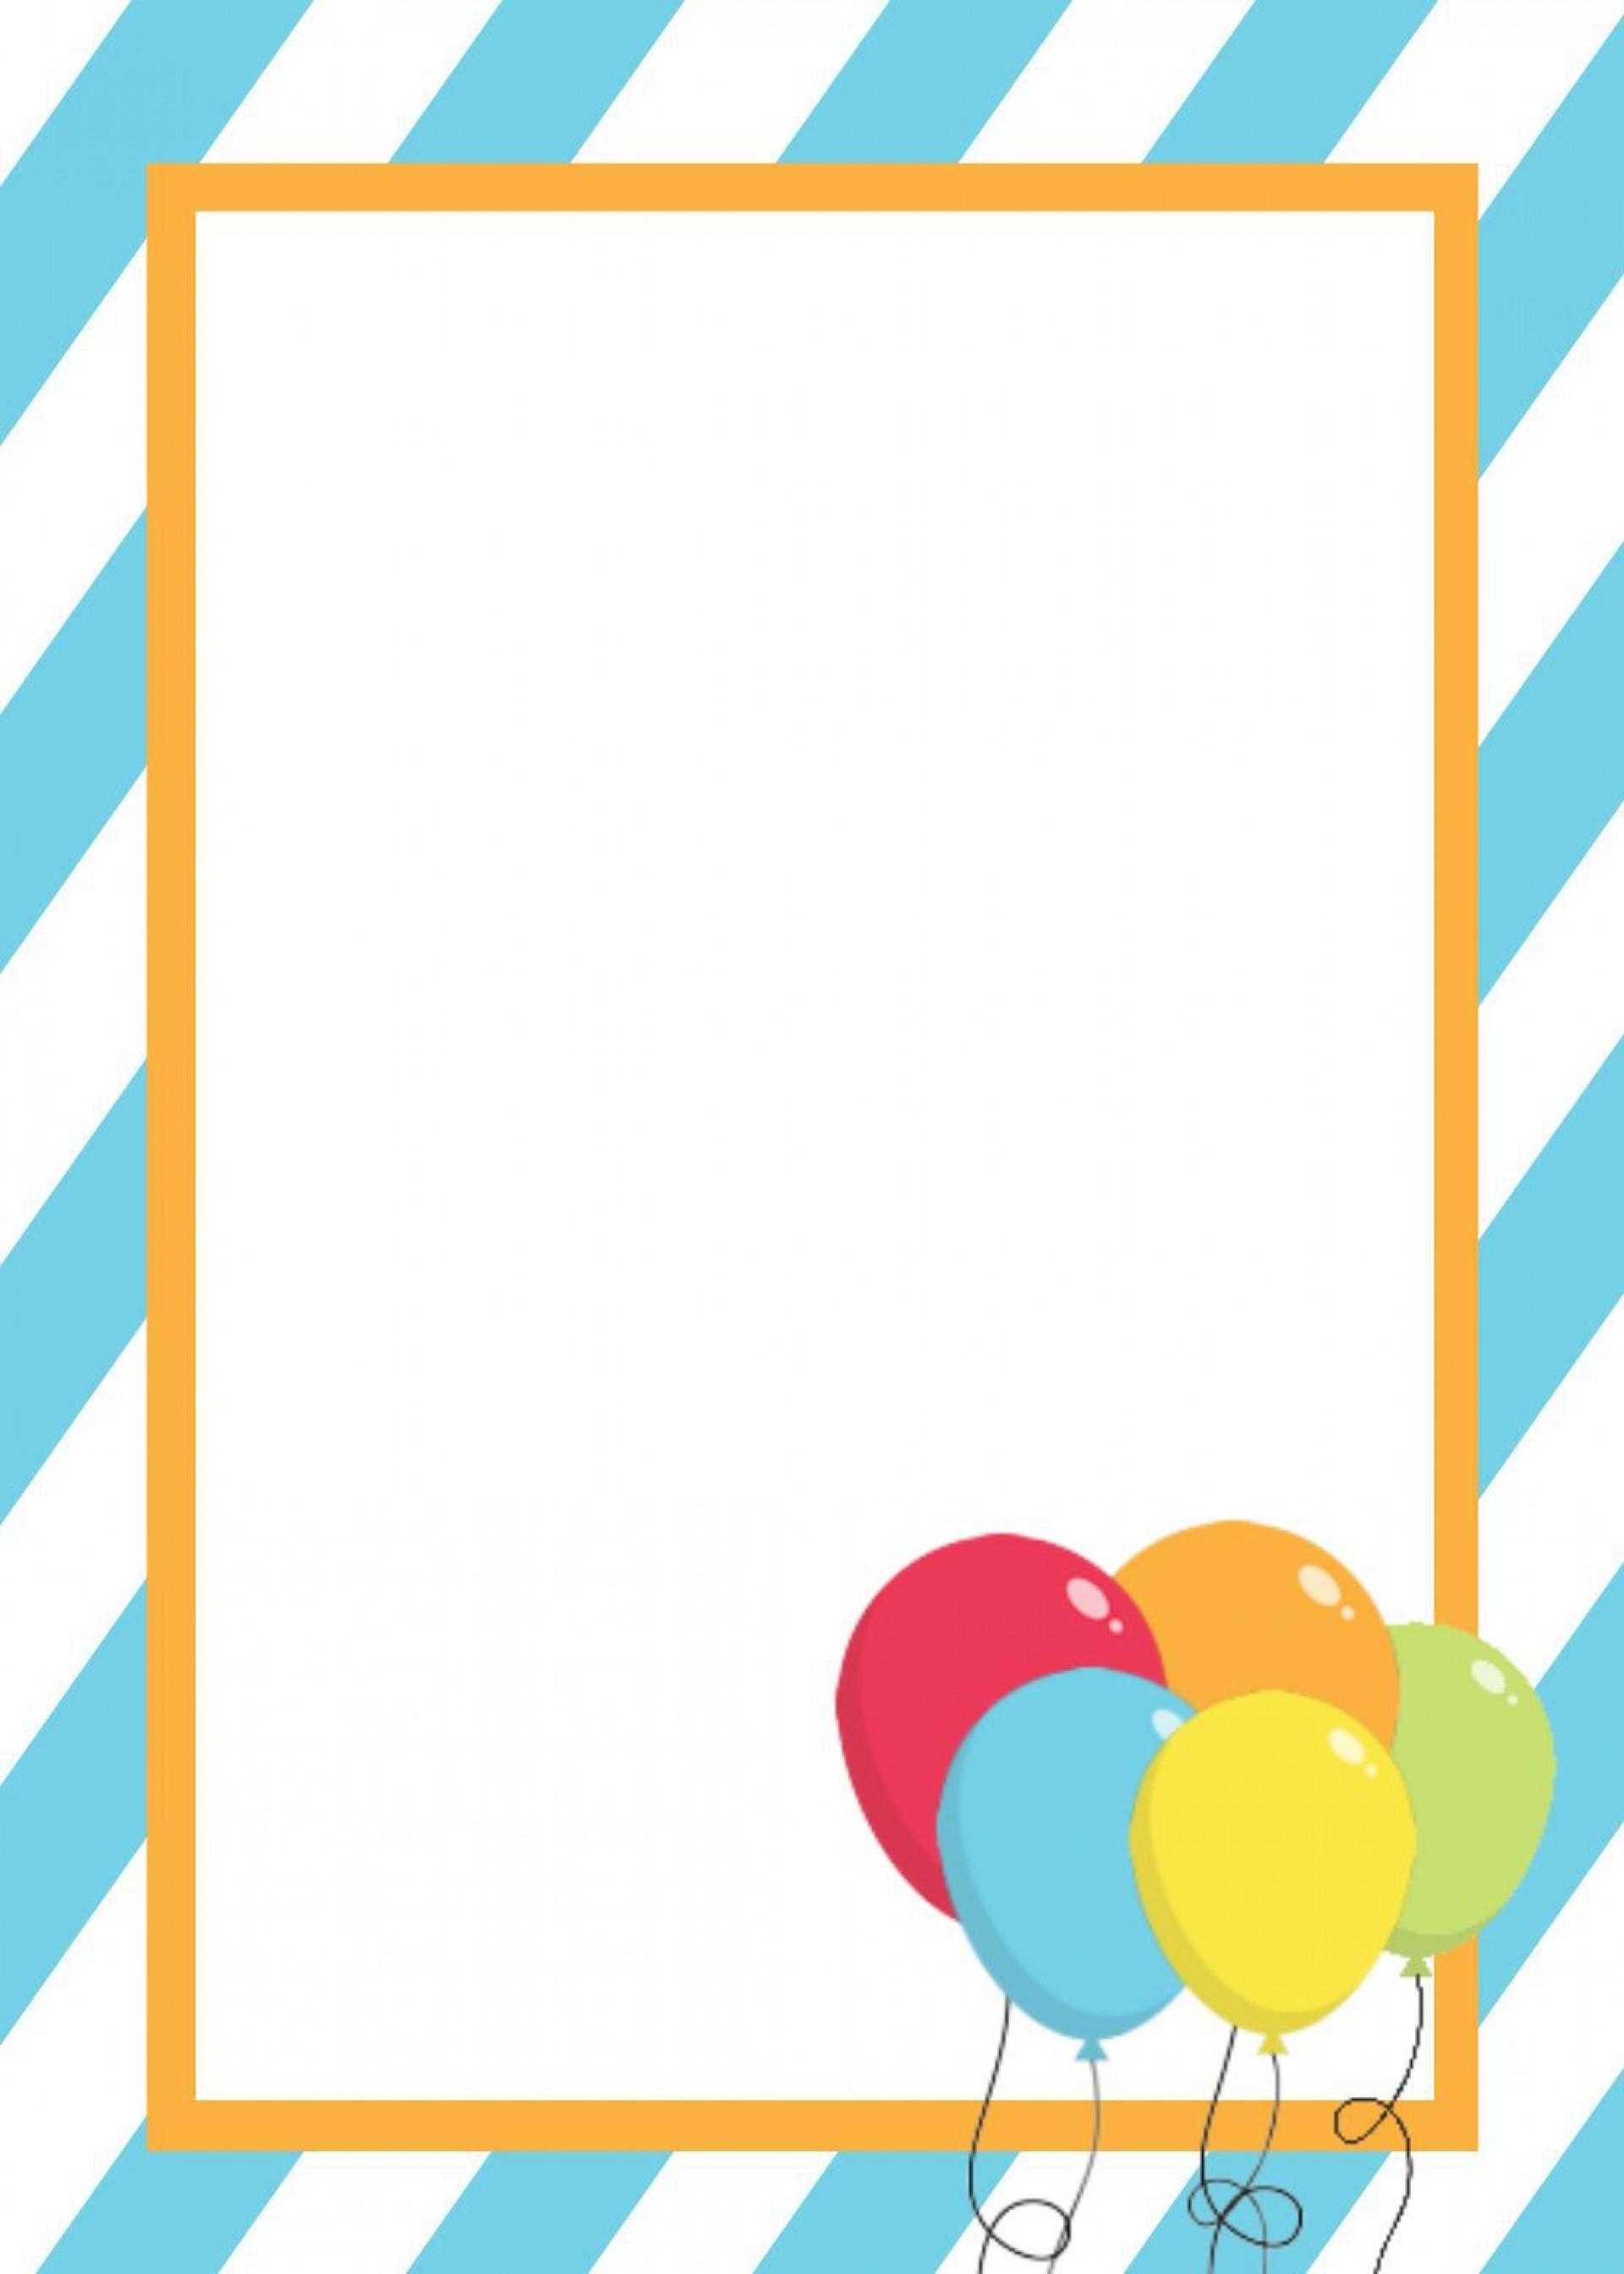 002 Stirring Blank Birthday Invitation Template For Microsoft Word Highest Quality 1920